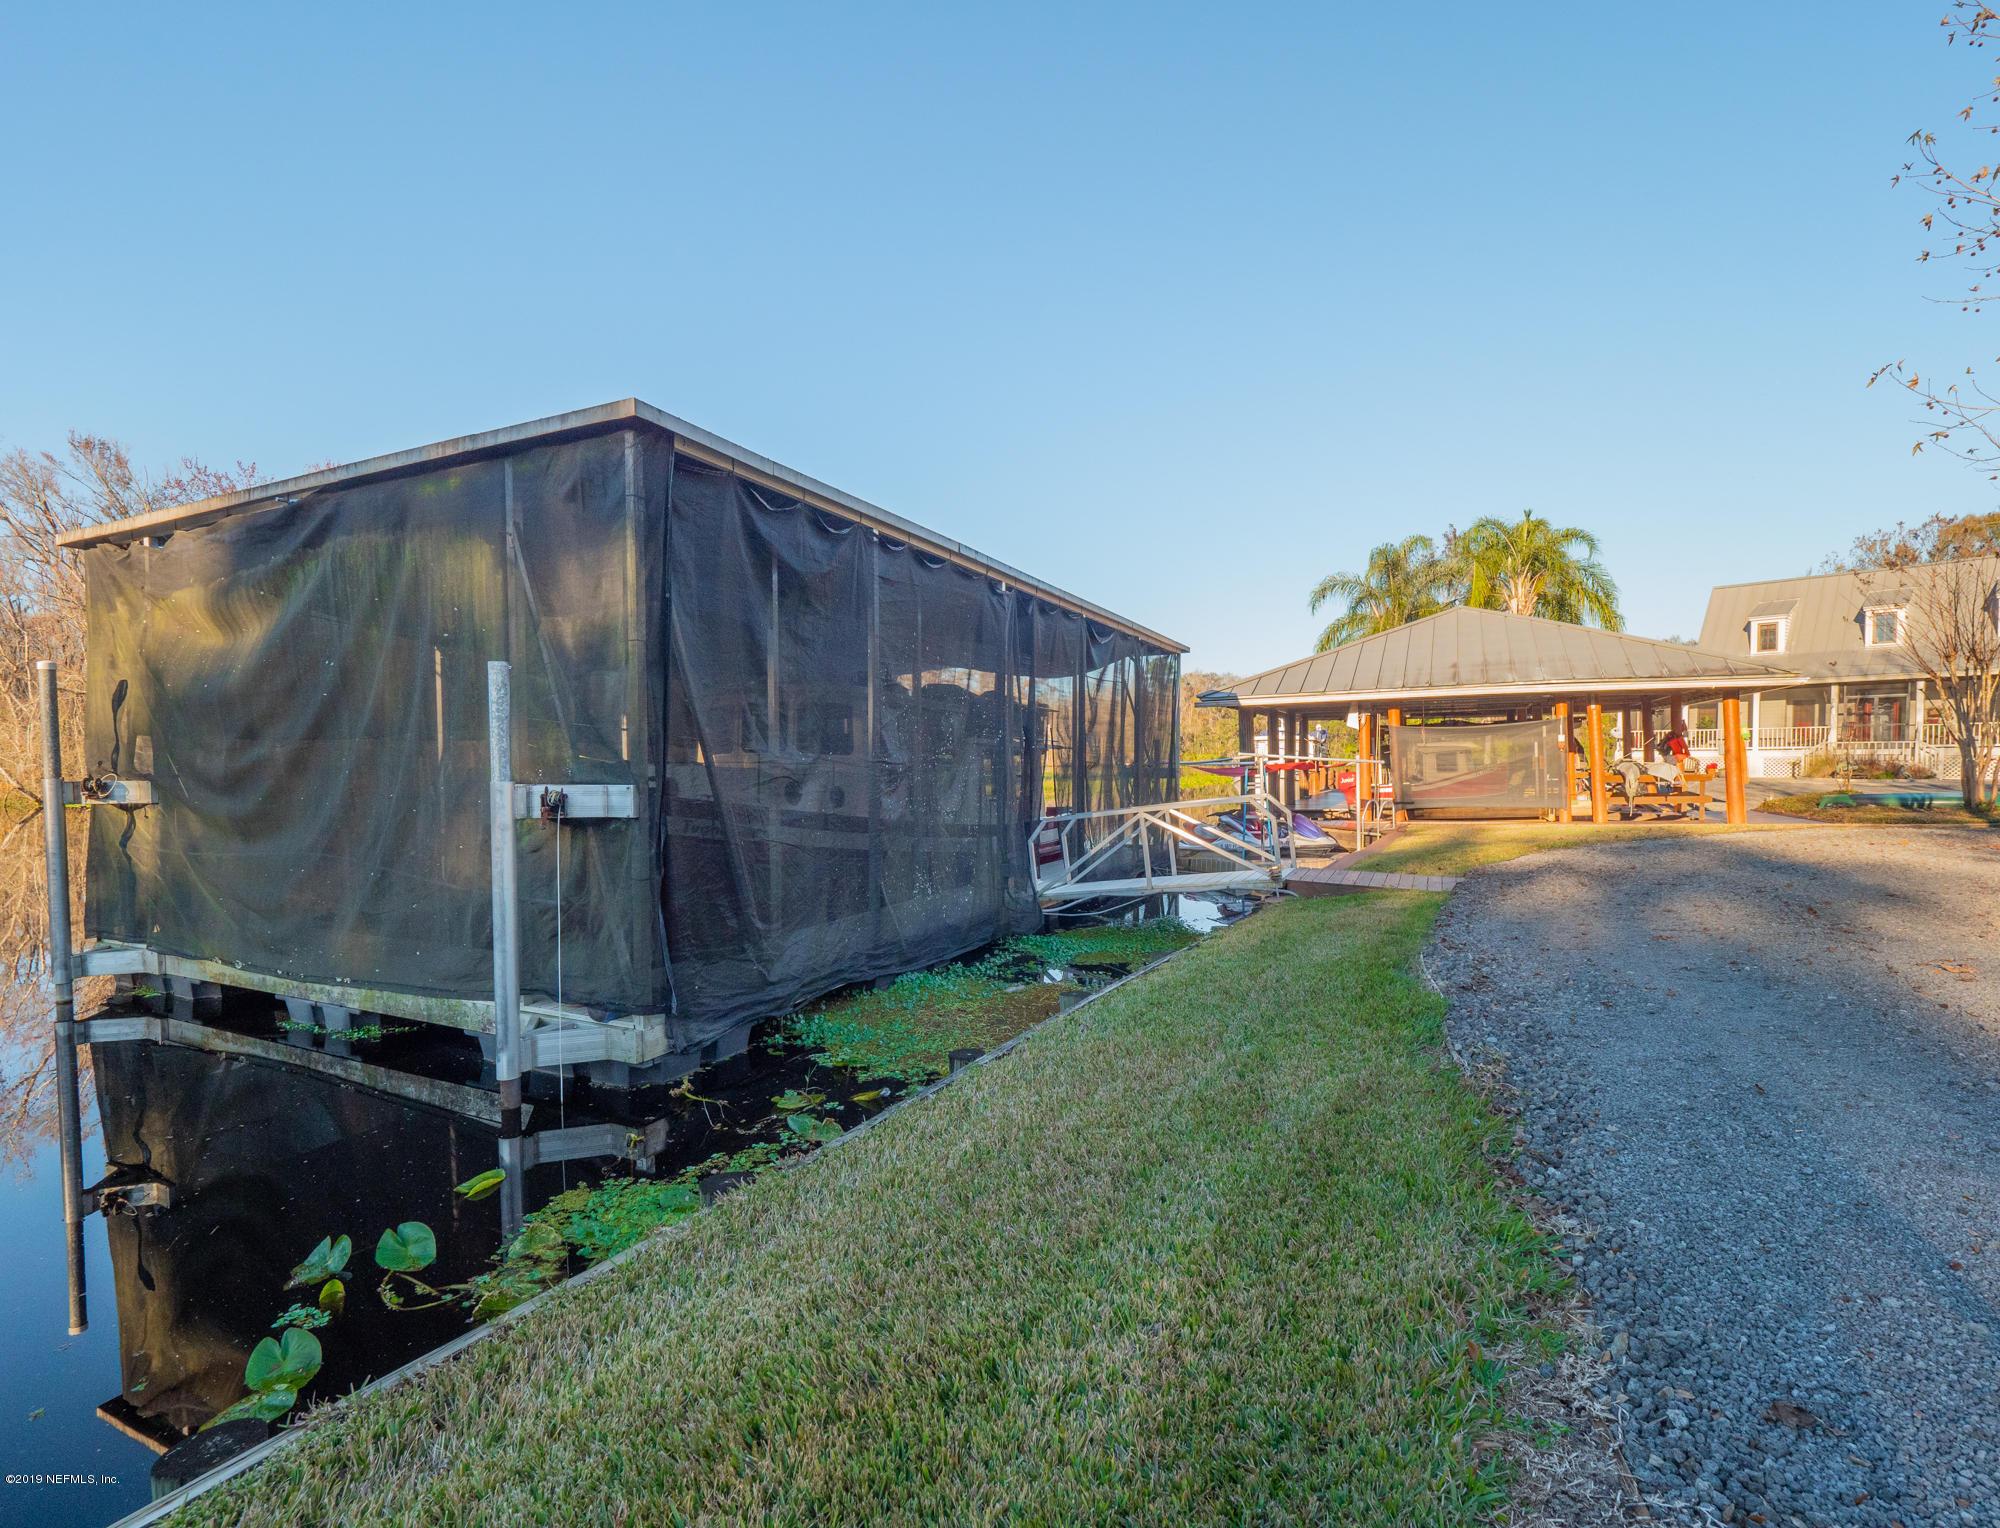 1802 OAK PARK, GREEN COVE SPRINGS, FLORIDA 32043, 3 Bedrooms Bedrooms, ,2 BathroomsBathrooms,Residential - single family,For sale,OAK PARK,976691